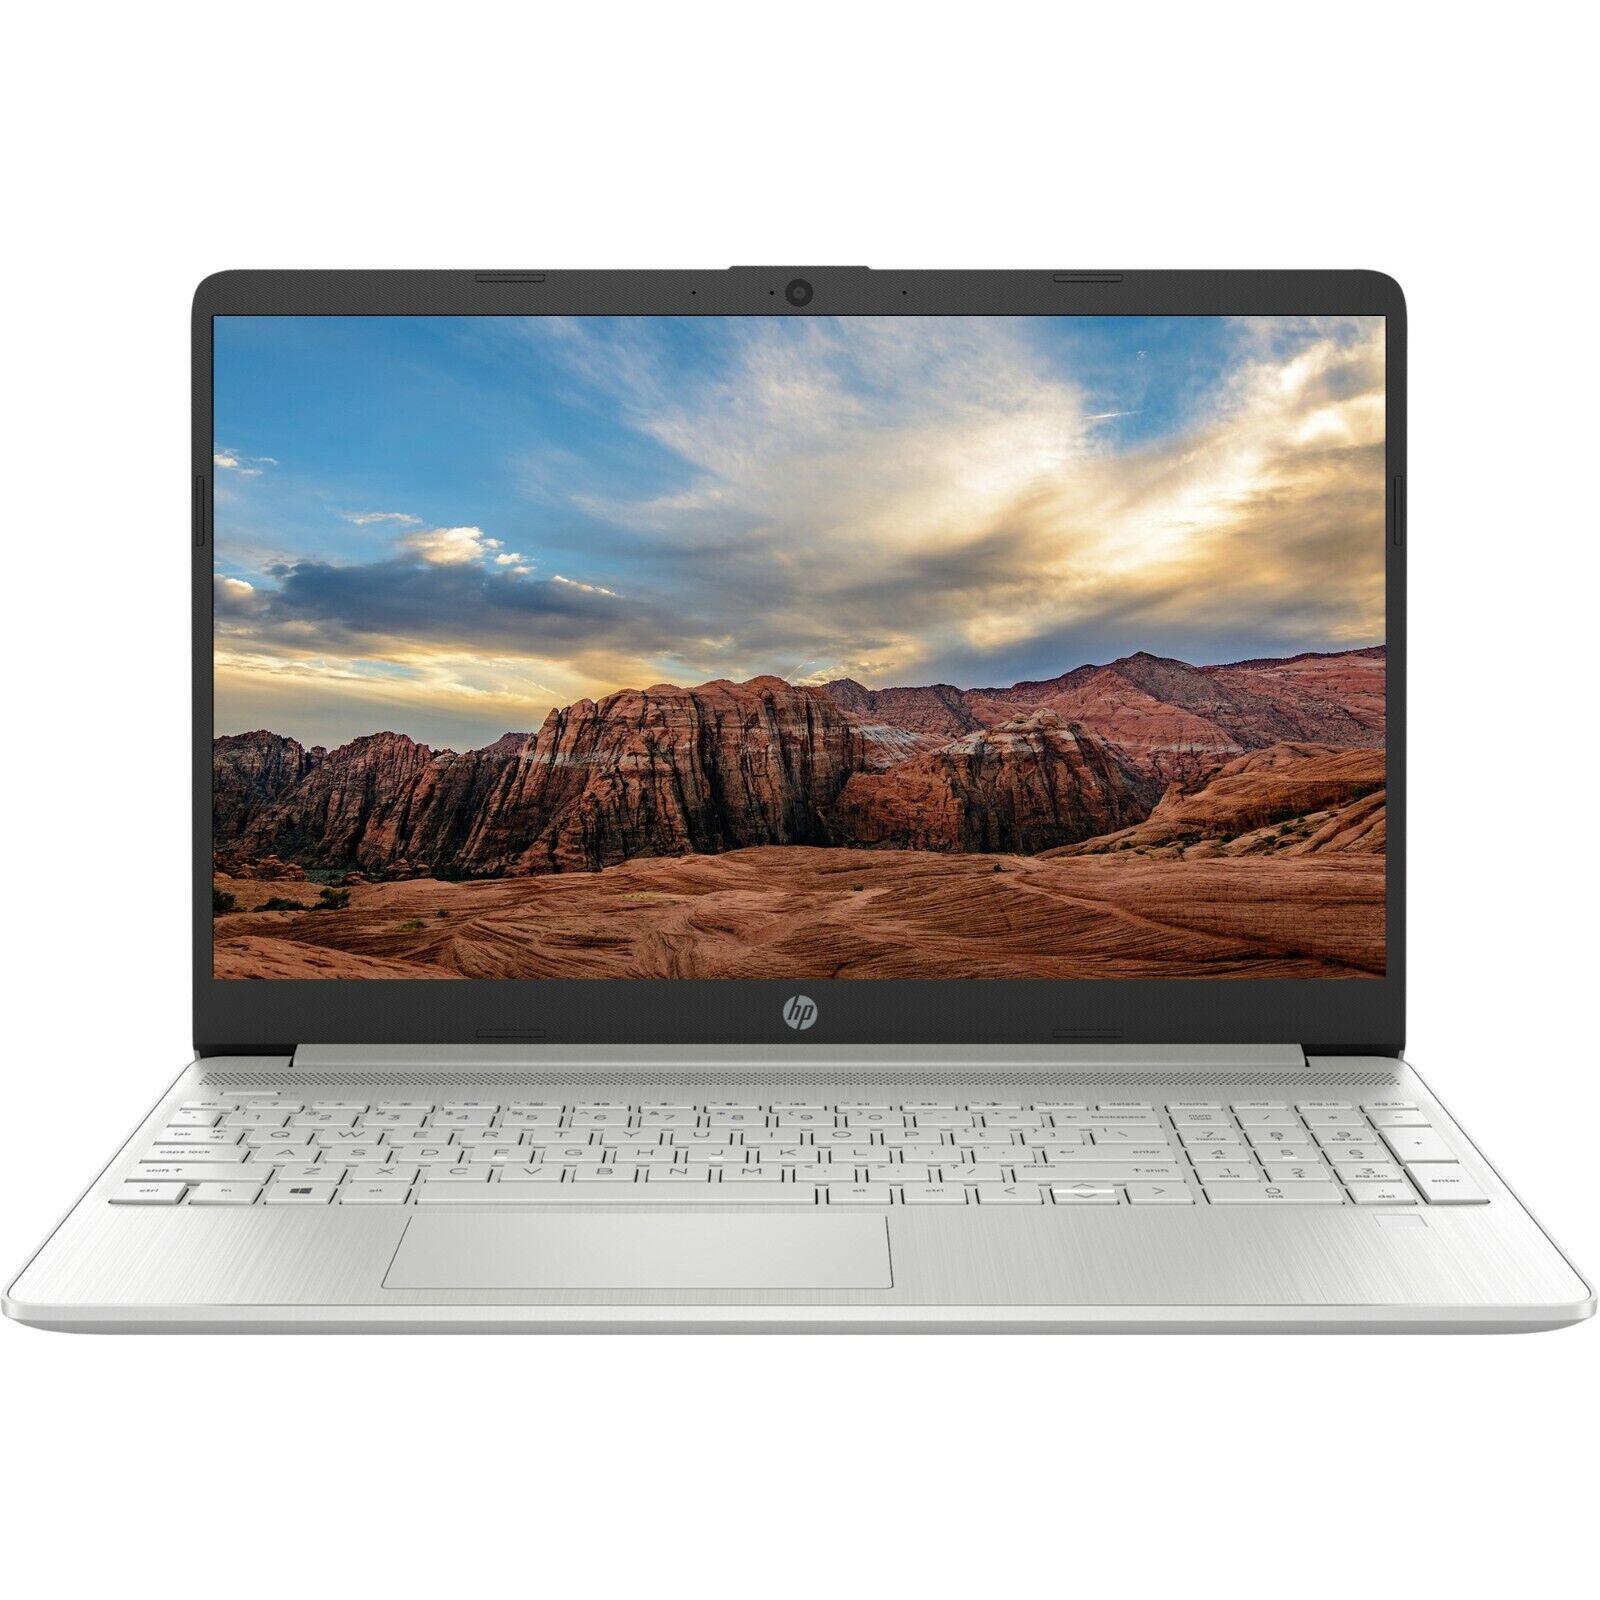 Laptop Windows - NEW HP 15.6 HD Intel i3-1005G1 3.4GHz 256GB SSD 8GB RAM Webcam+Mic Windows 10